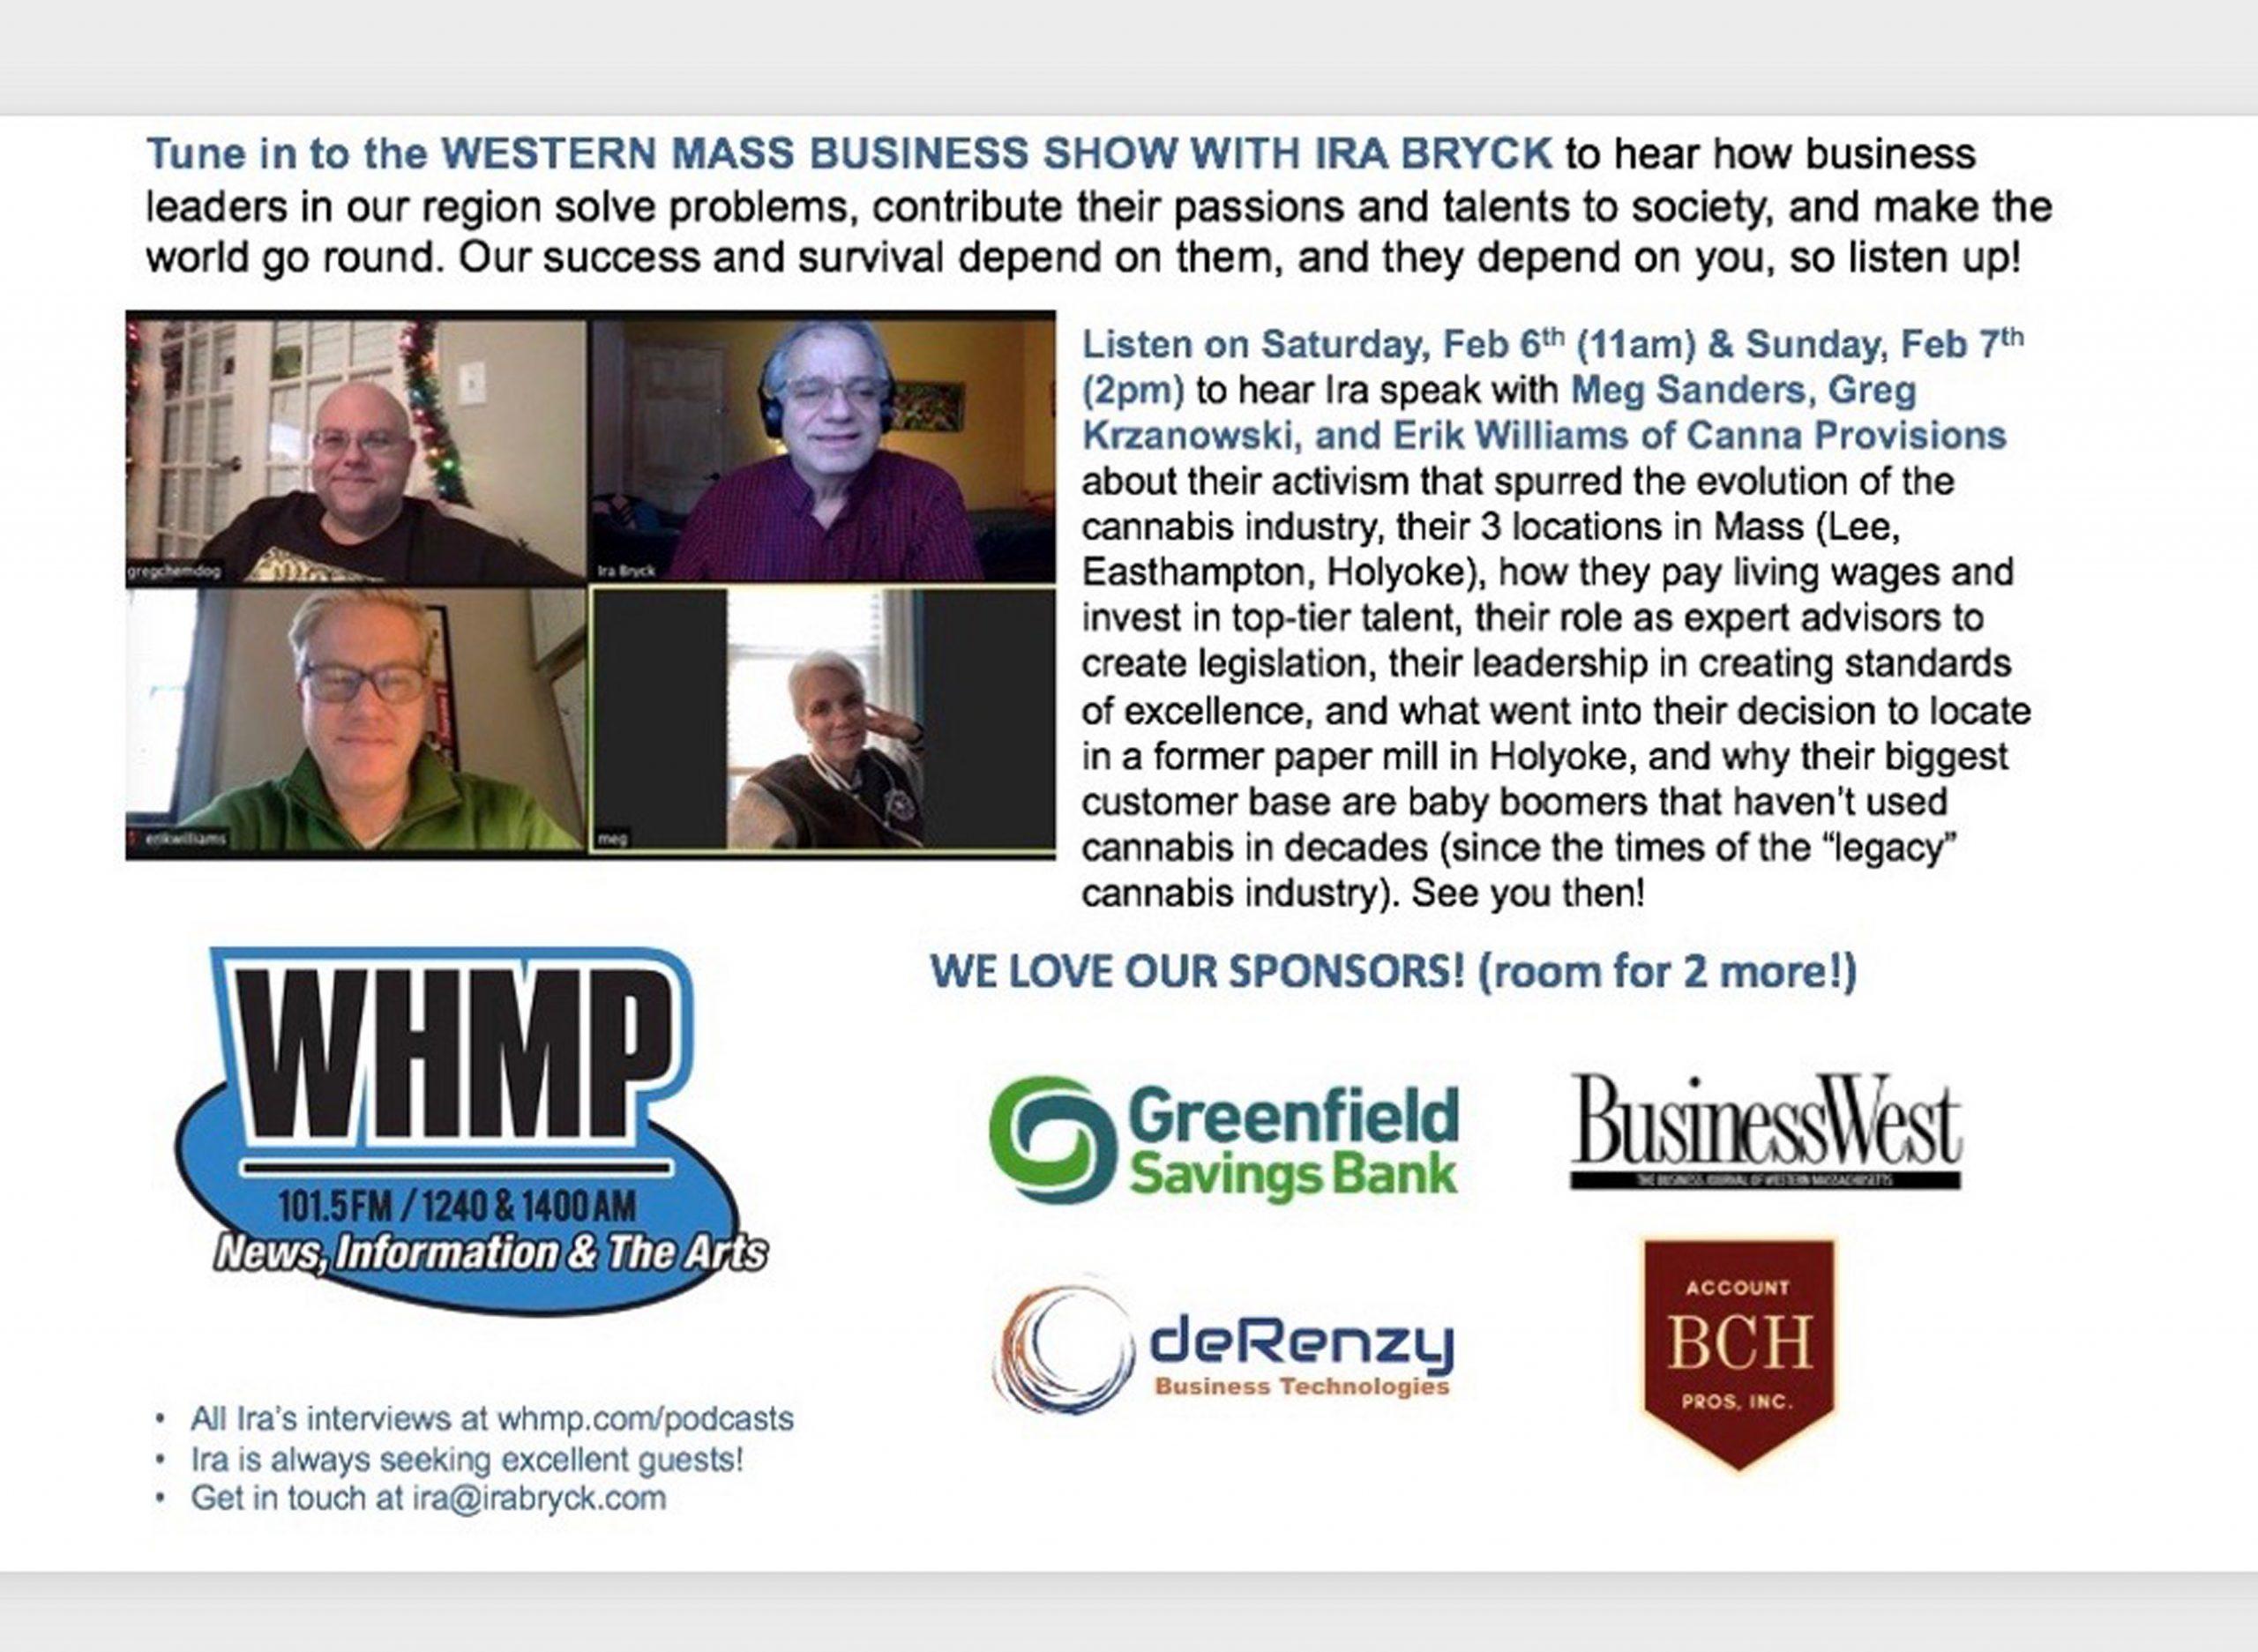 canna provisions chemdog greg krzanowski the western mass business show with ira bryck